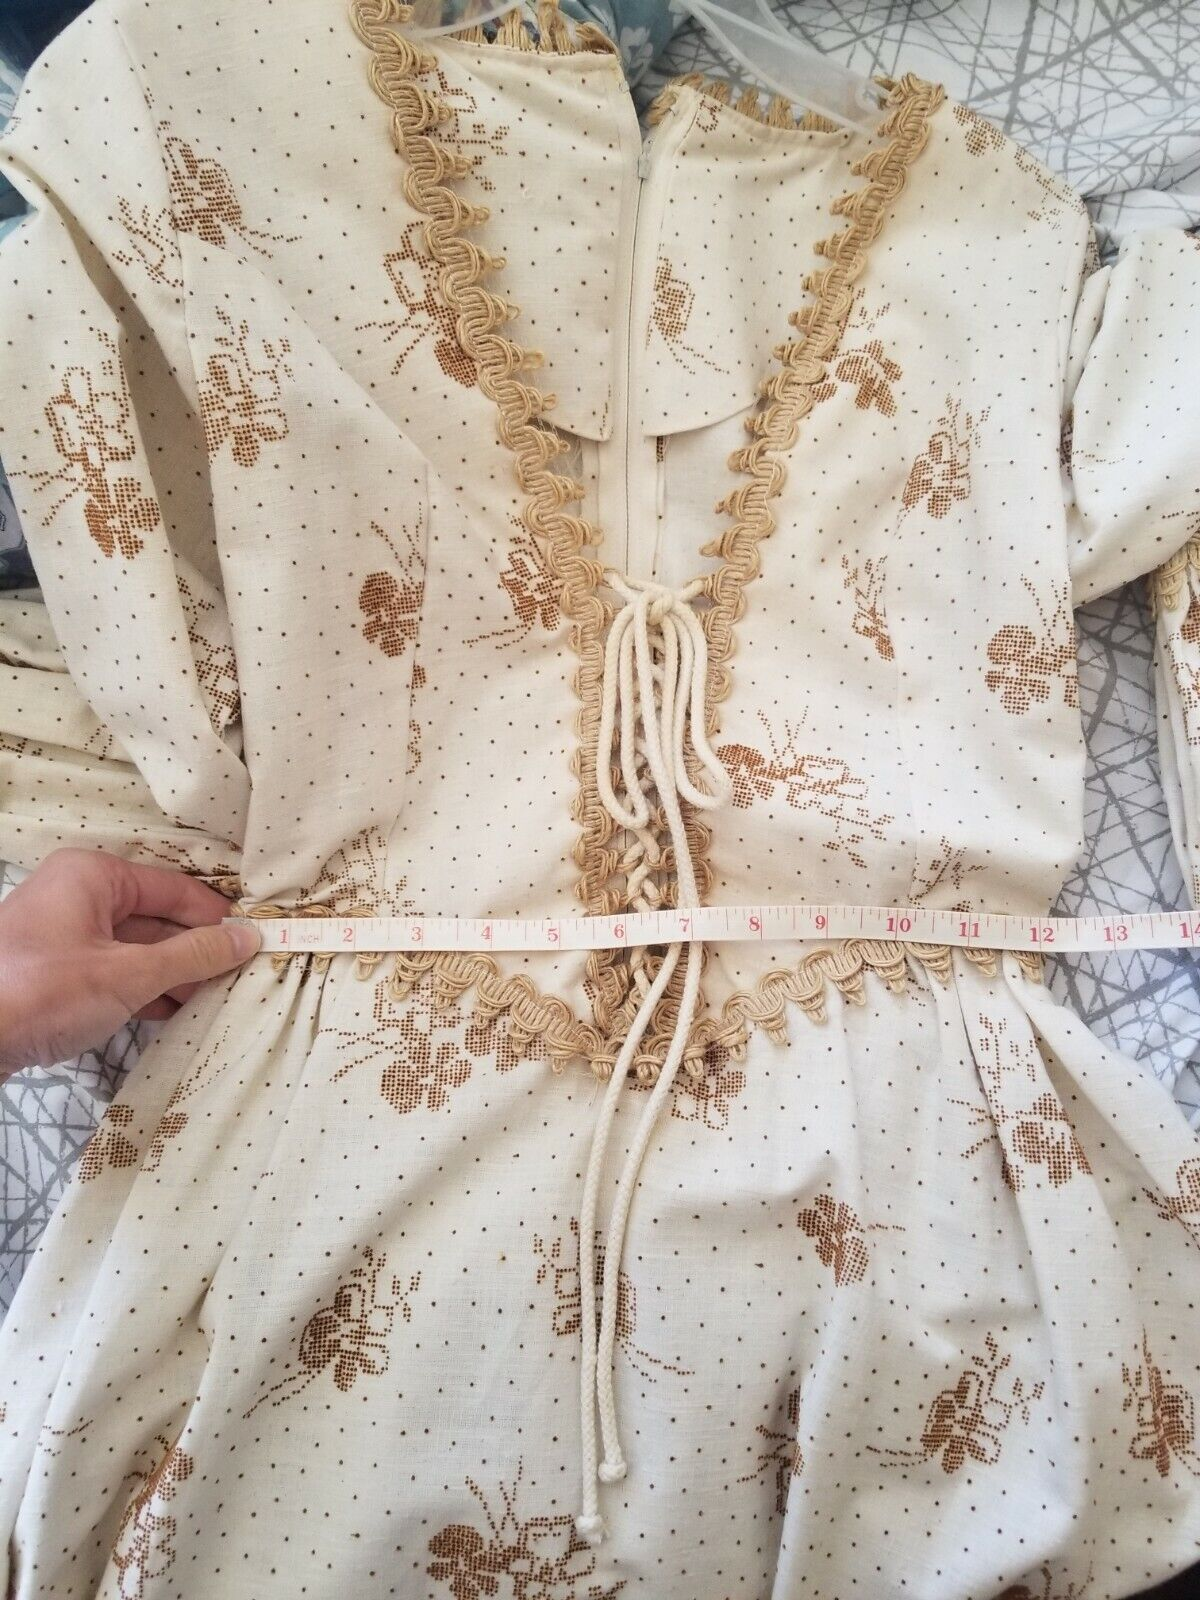 Gunne Sax Renaissance Dress - image 4